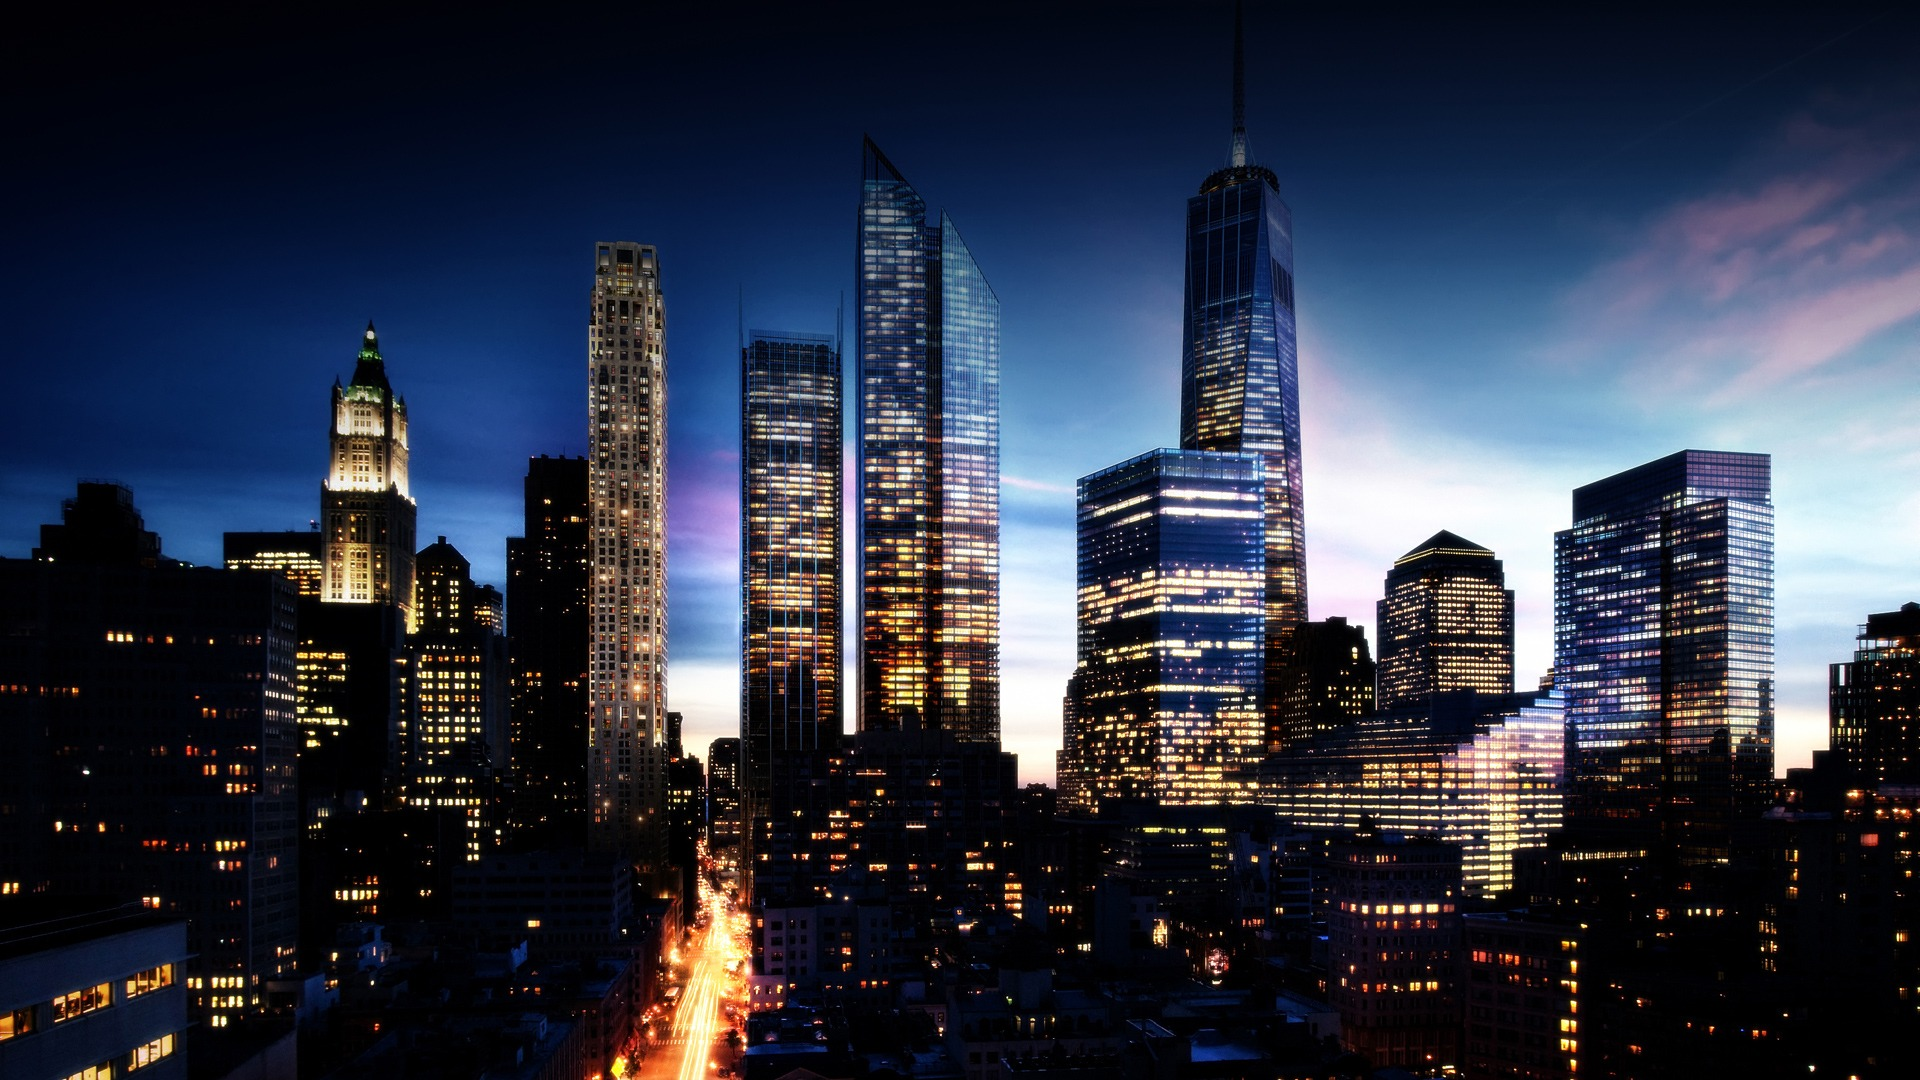 High Resolution New York Skyline at Night Wallpaper HD 1 City 1920x1080